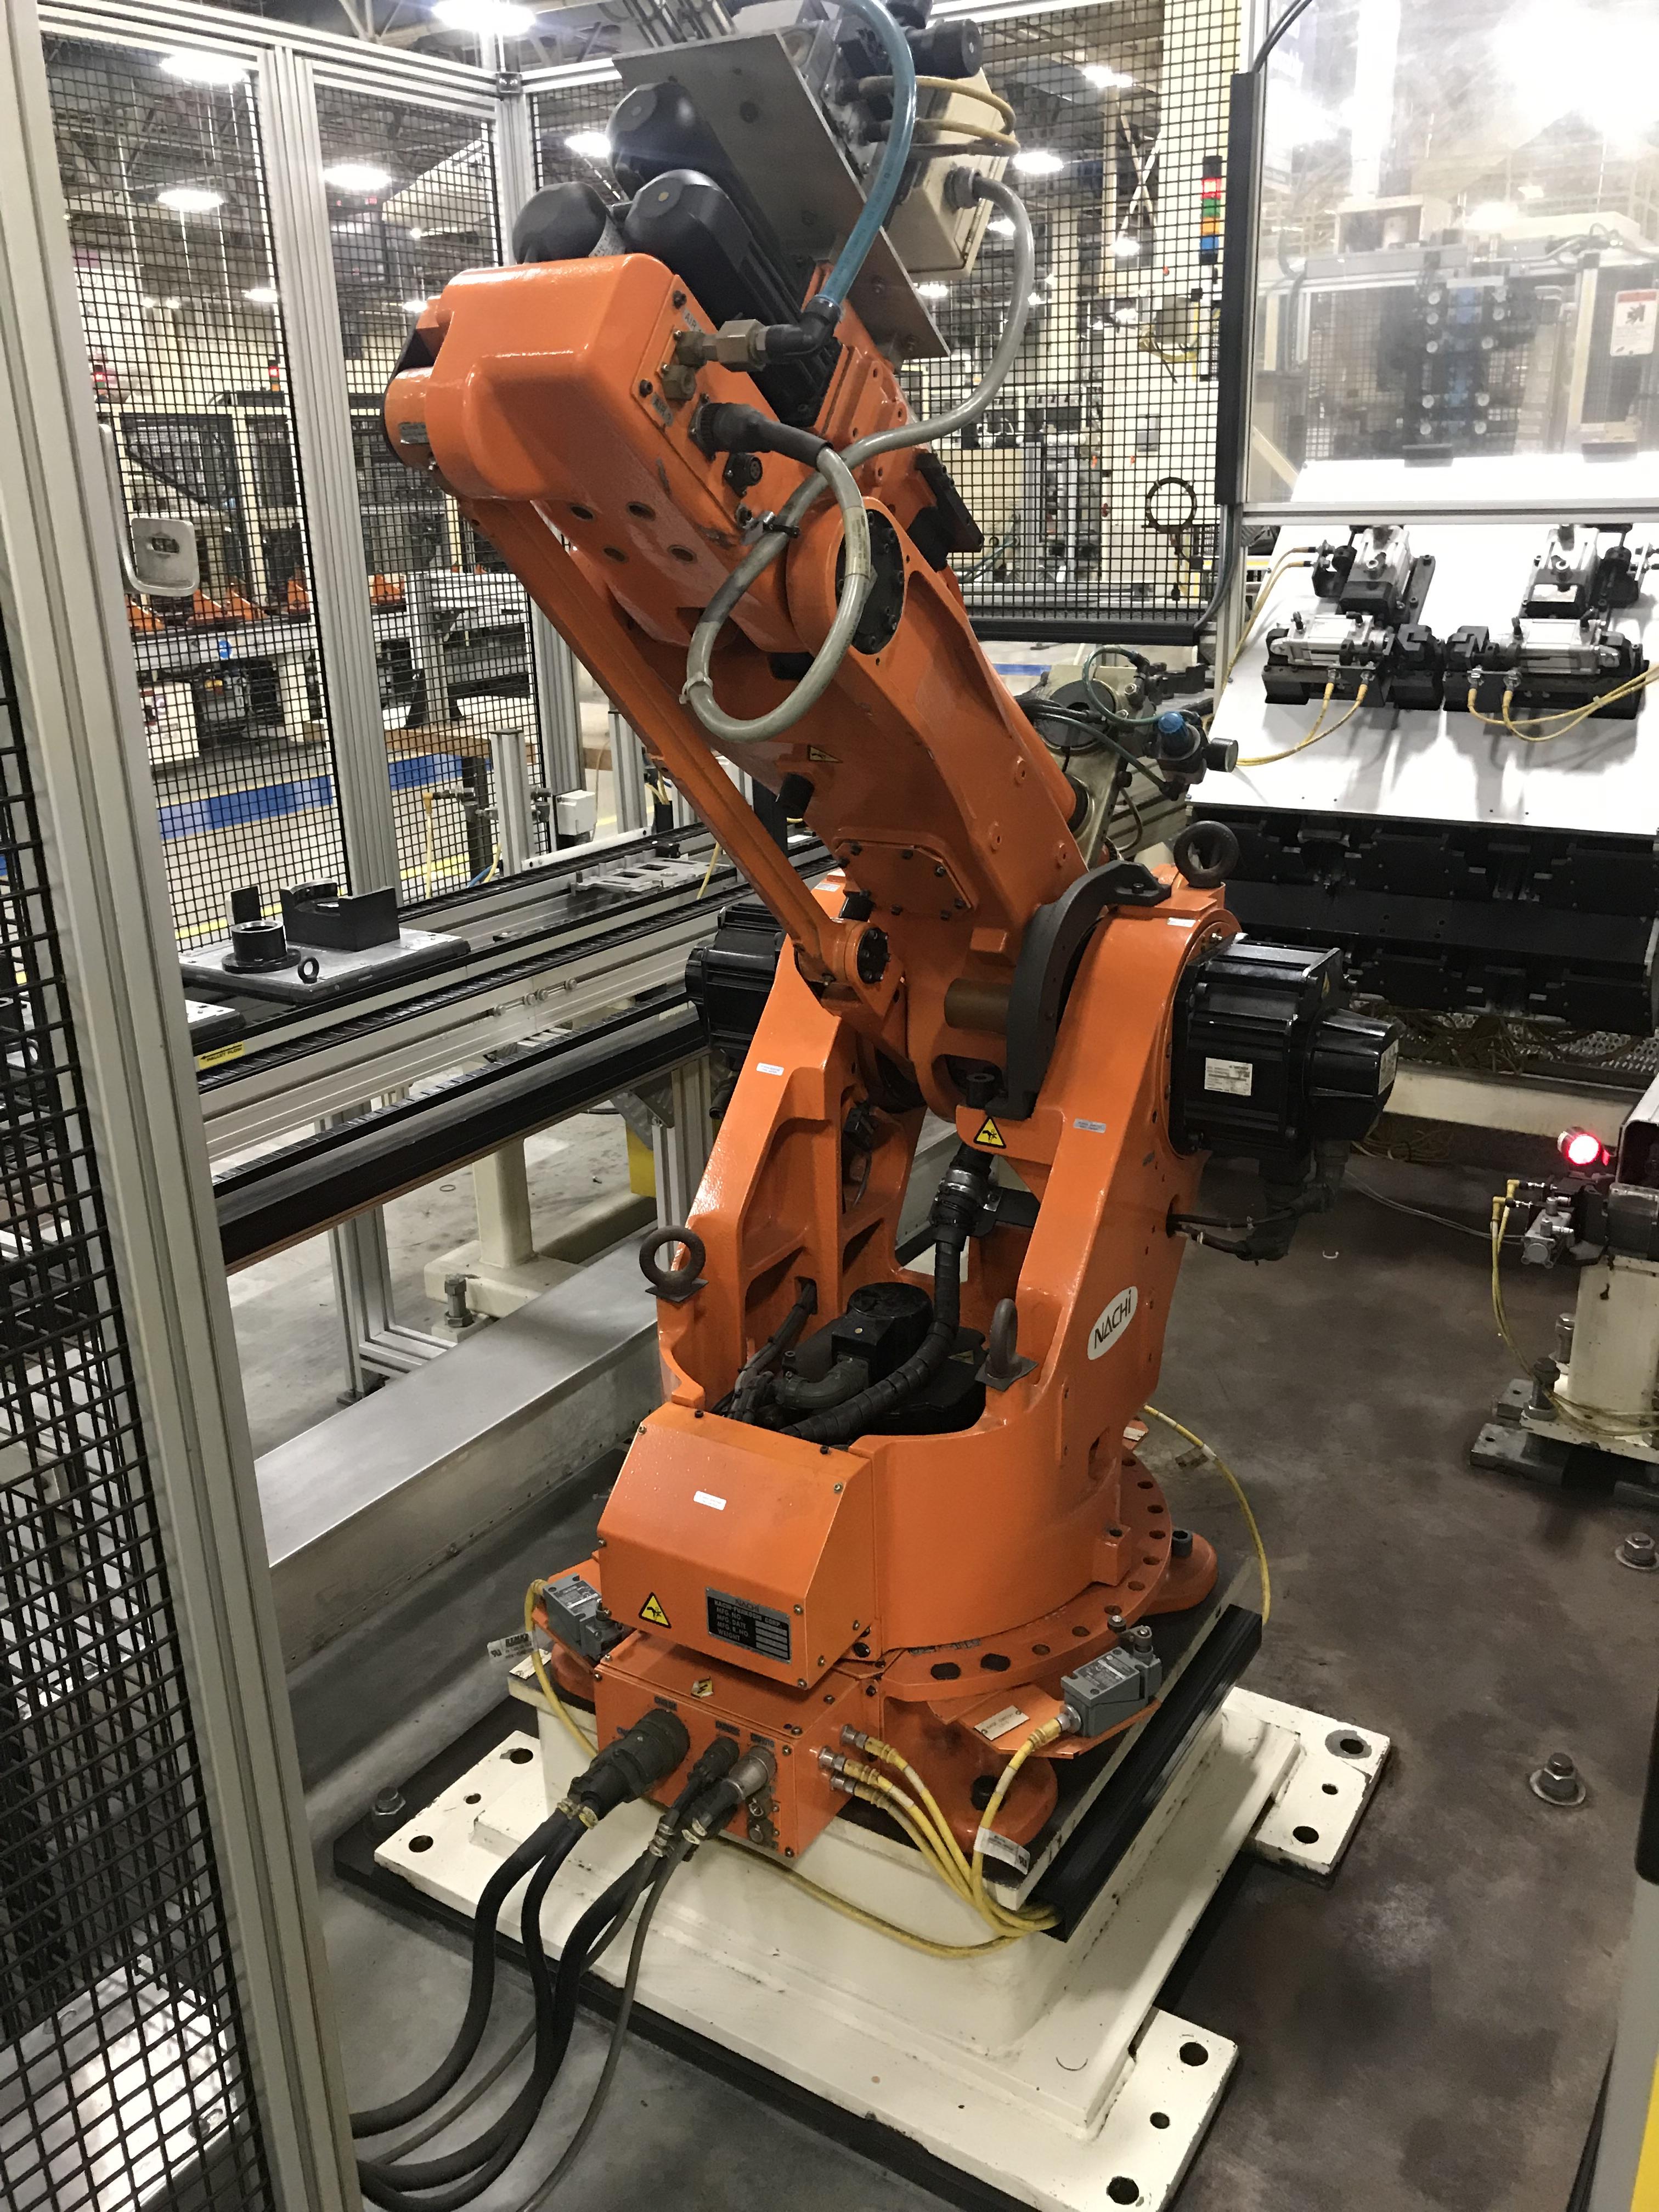 Lot 142 - 2002 Nachi SC50F-01 Robot